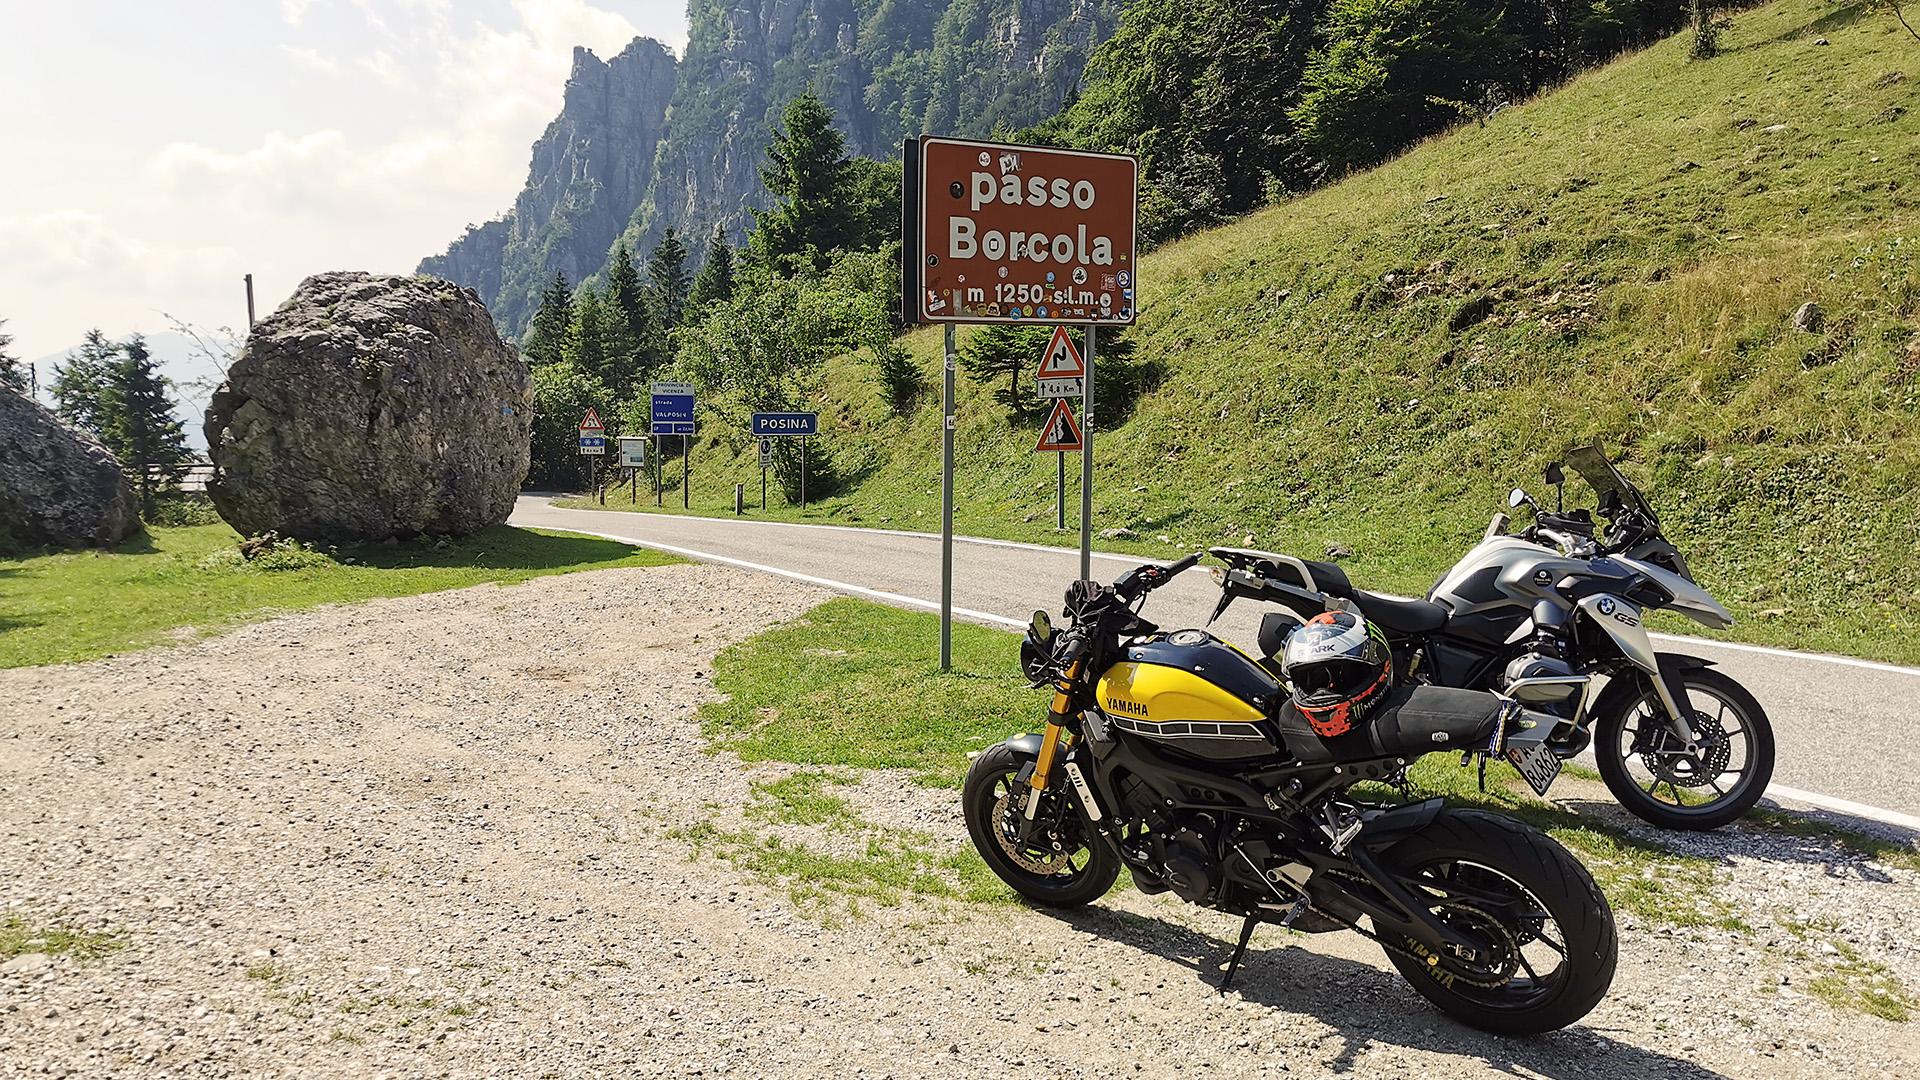 1250 - I - Passo Borcola